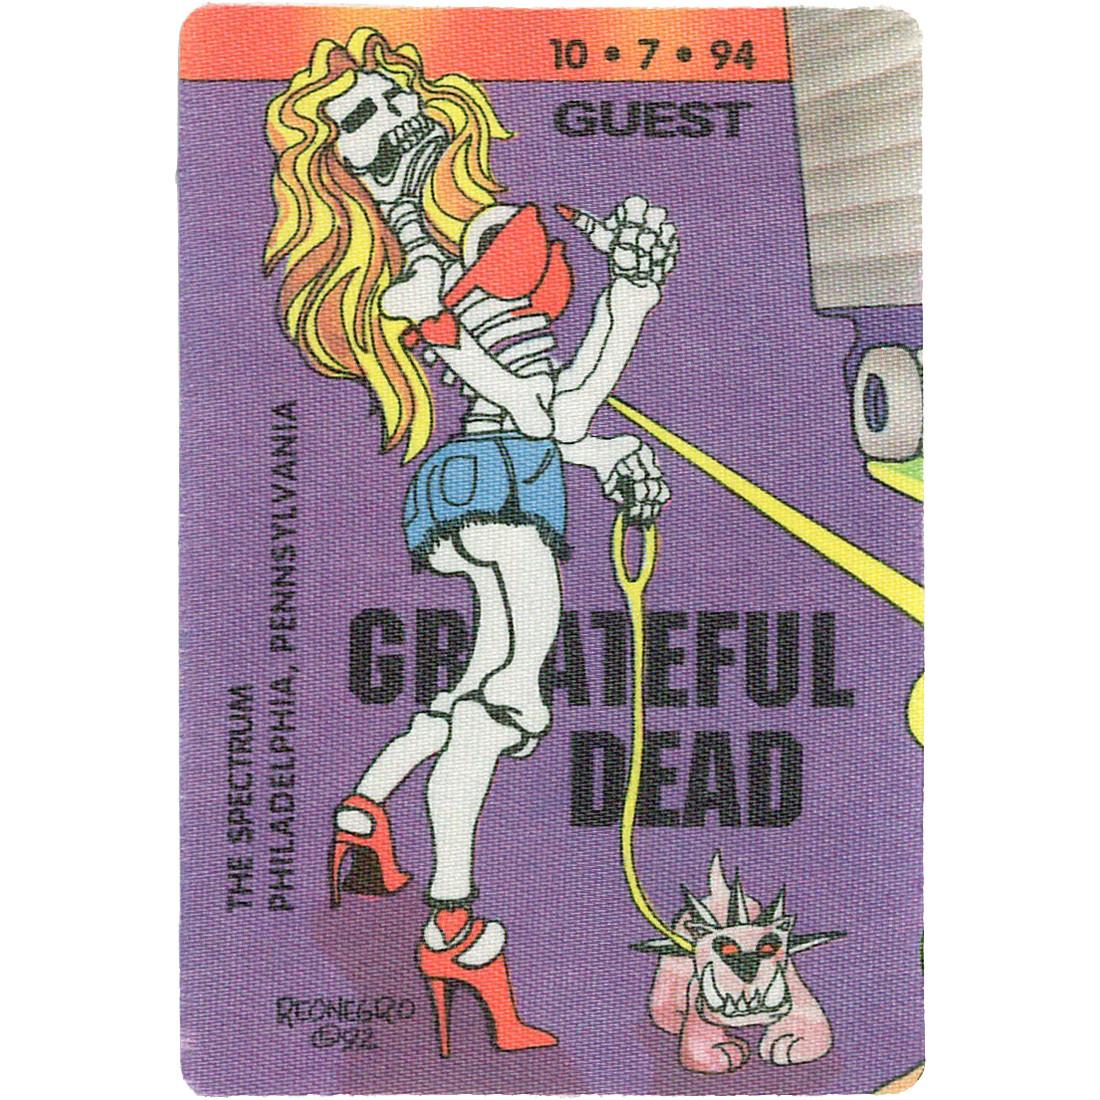 Grateful Dead 1994 10-07 Backstage Pass